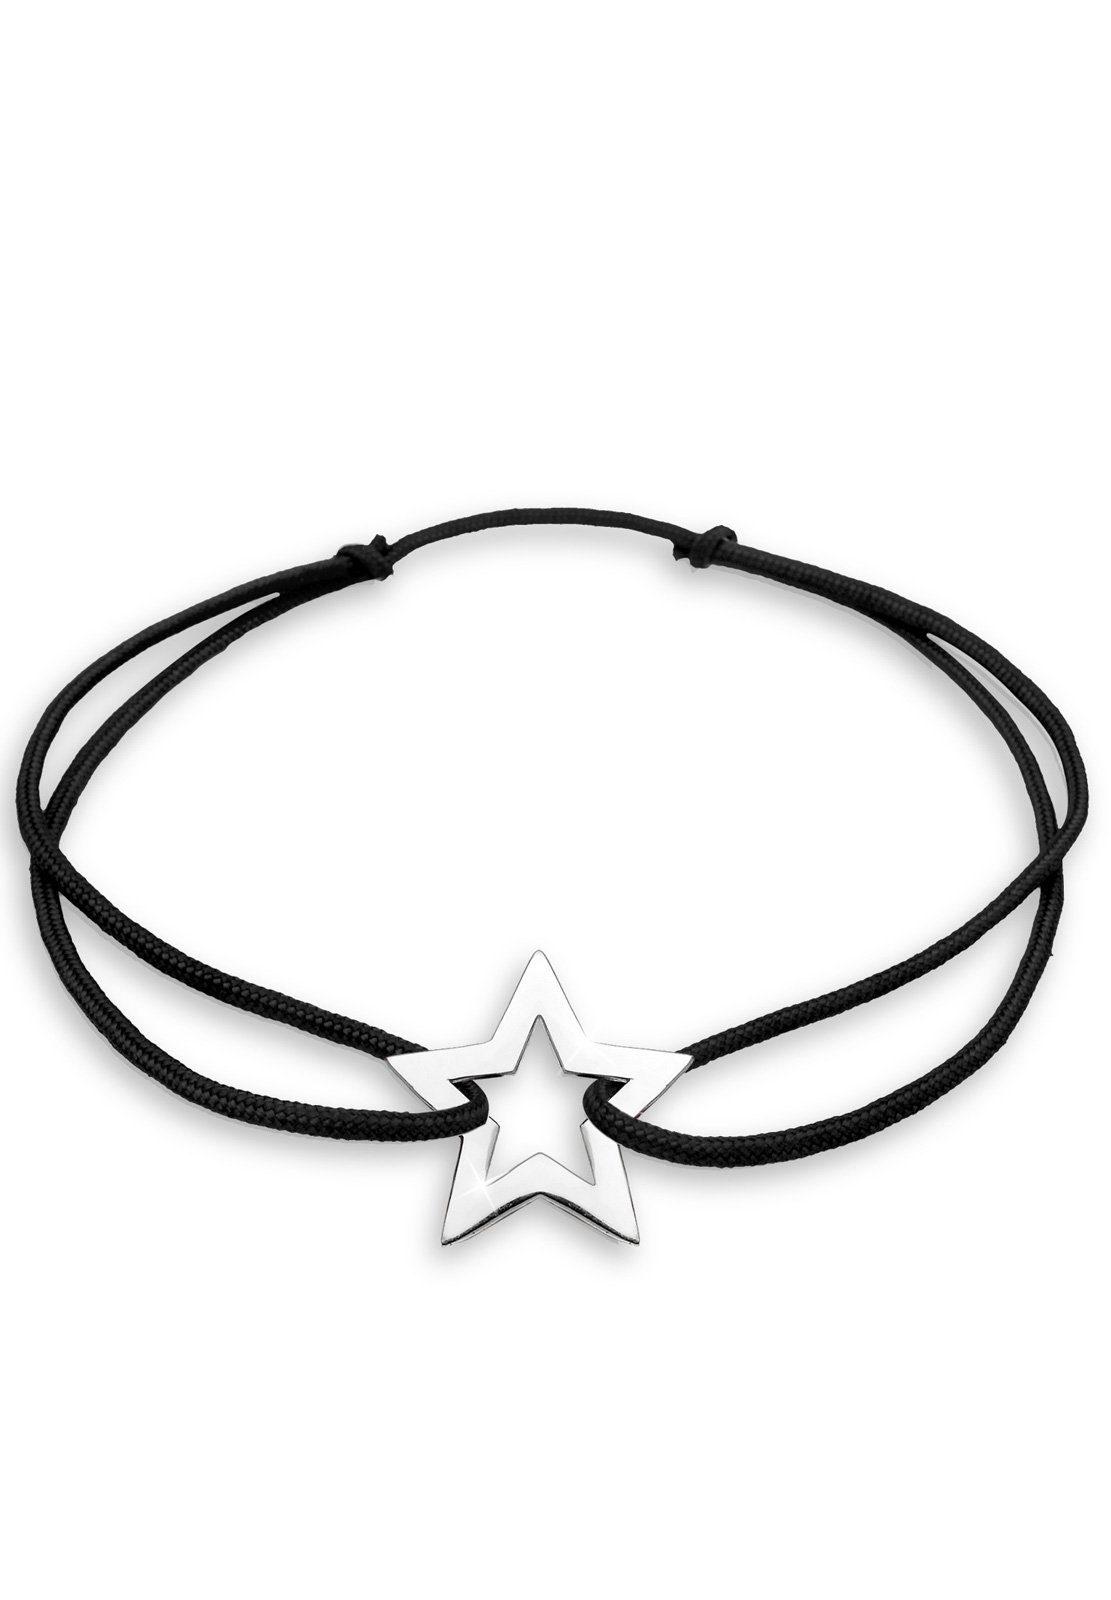 Armband Astro Himmel 925 Star Online Kaufen Elli Nylon »stern Silber« ChtrQds